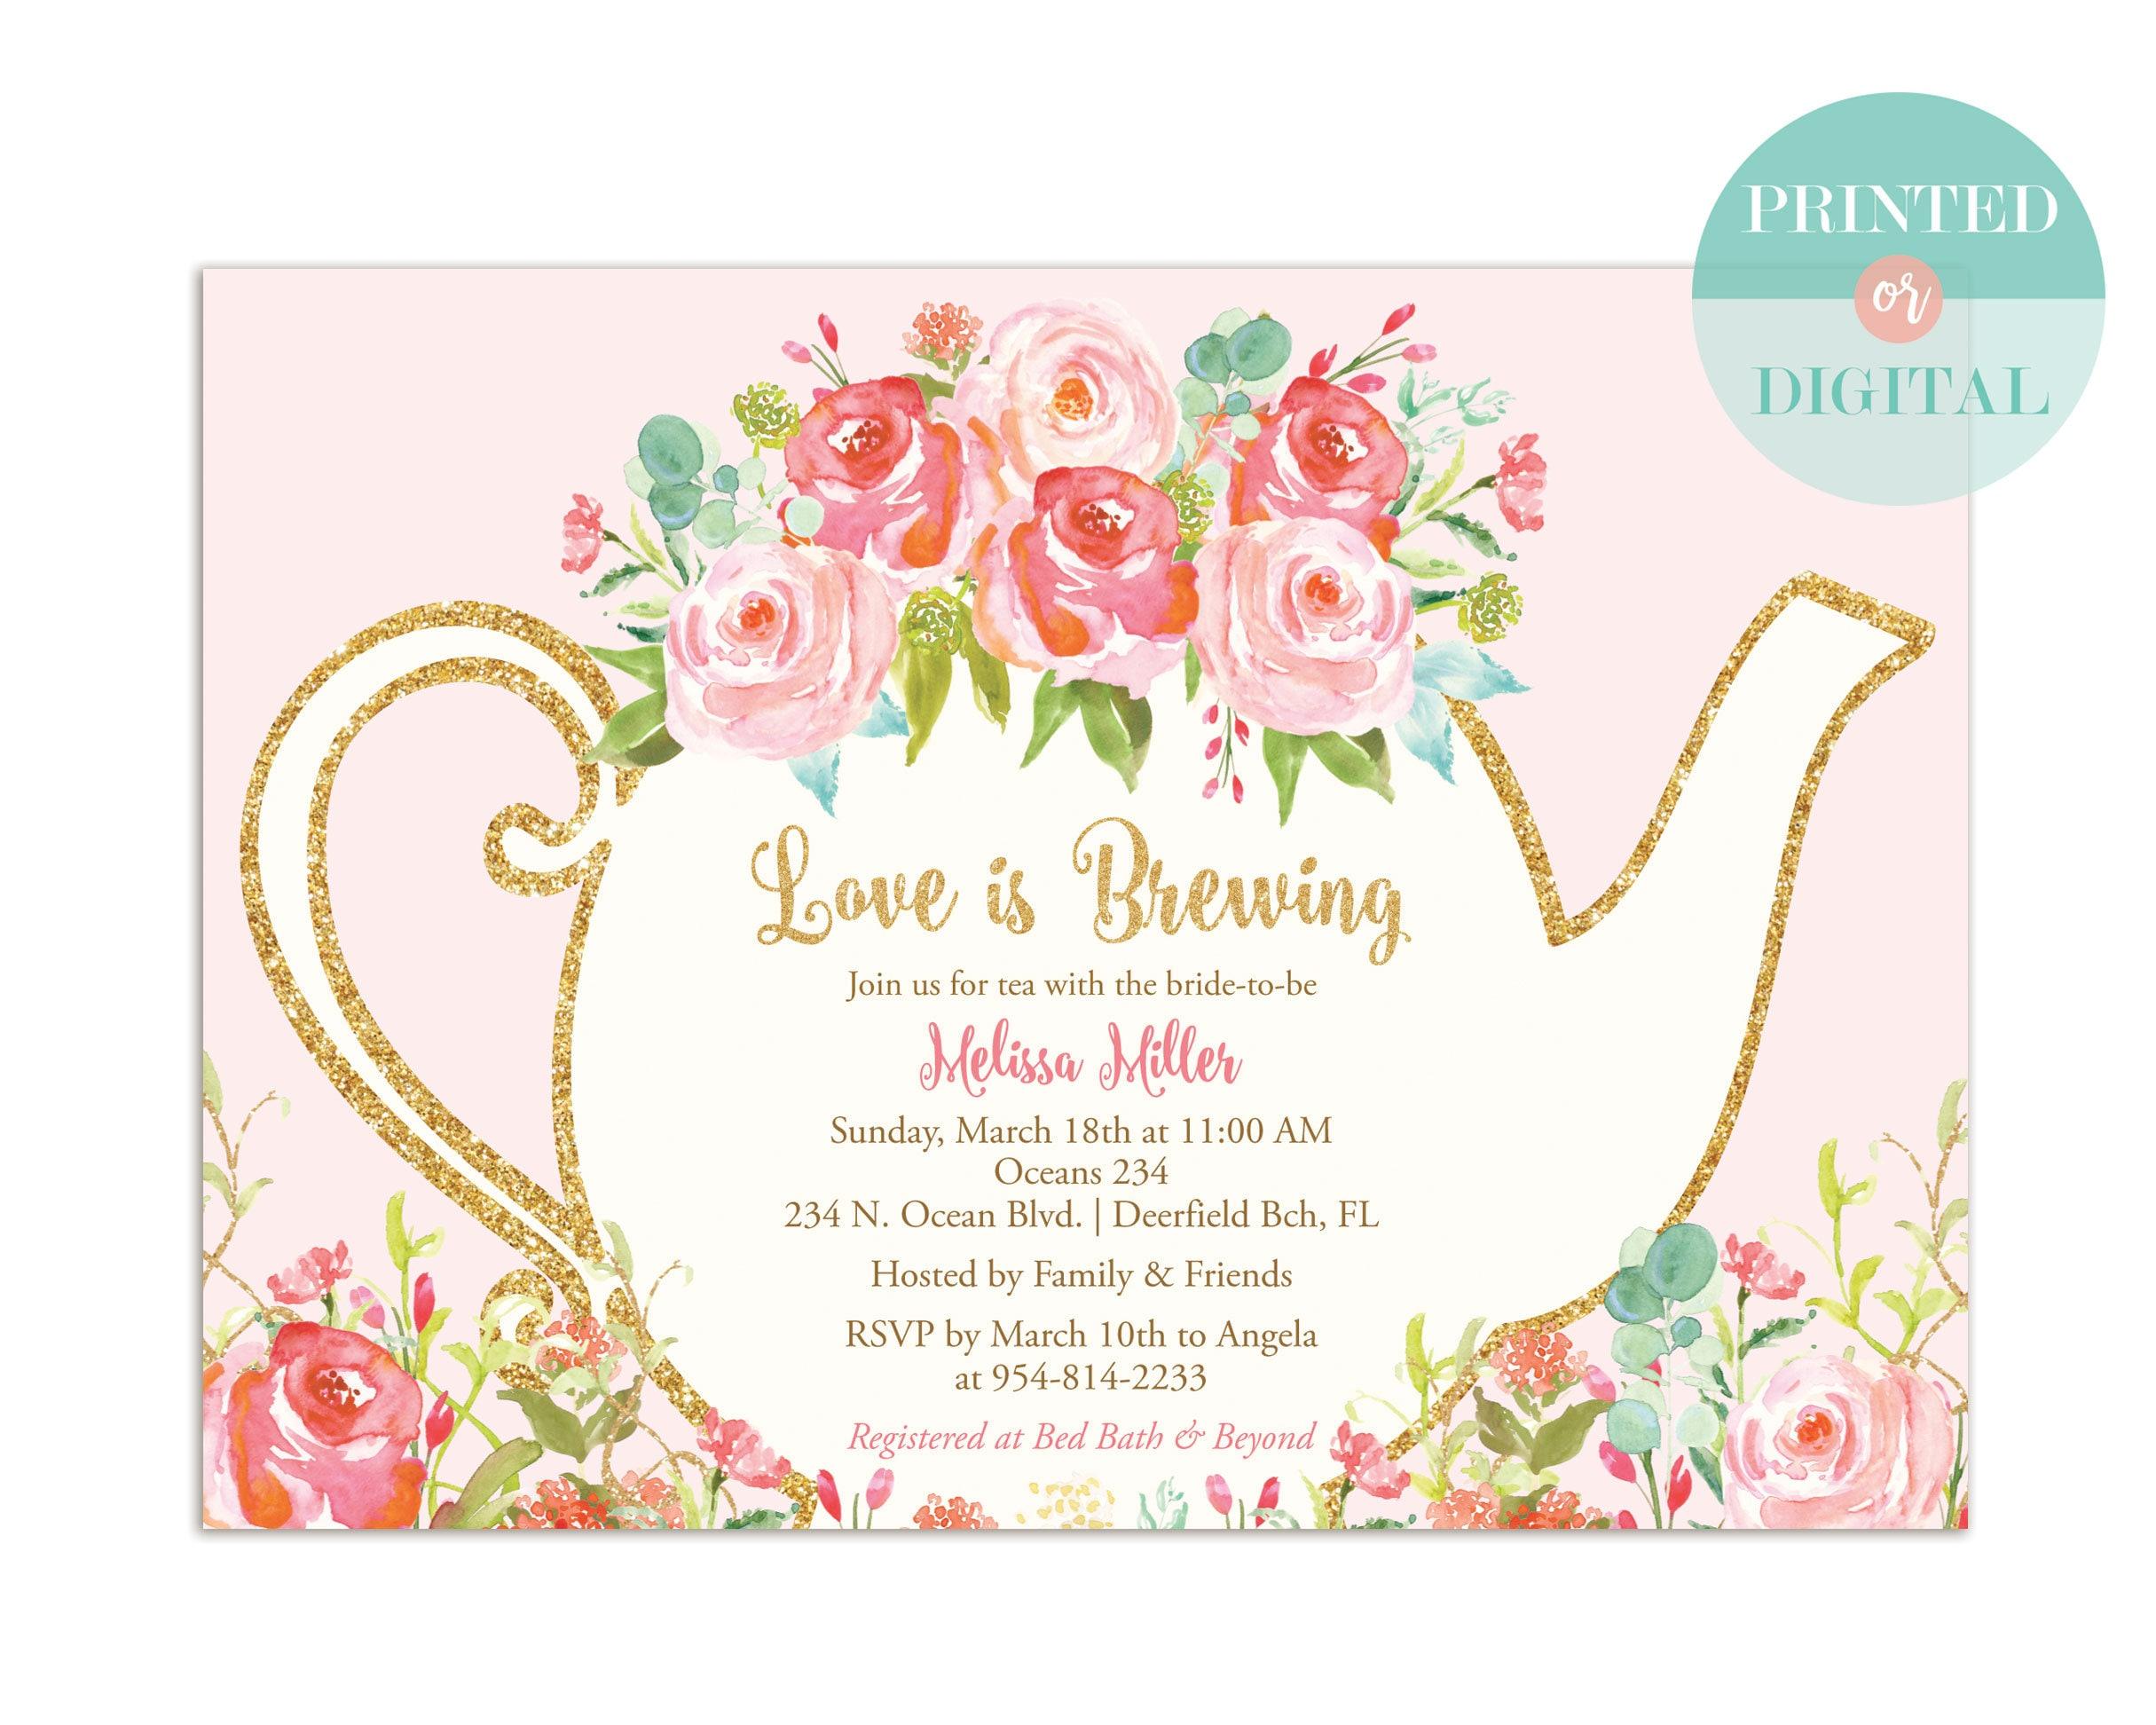 Vintage Tea Party Wedding Invitations: Bridal Shower Tea Party Invitation Garden Tea Party